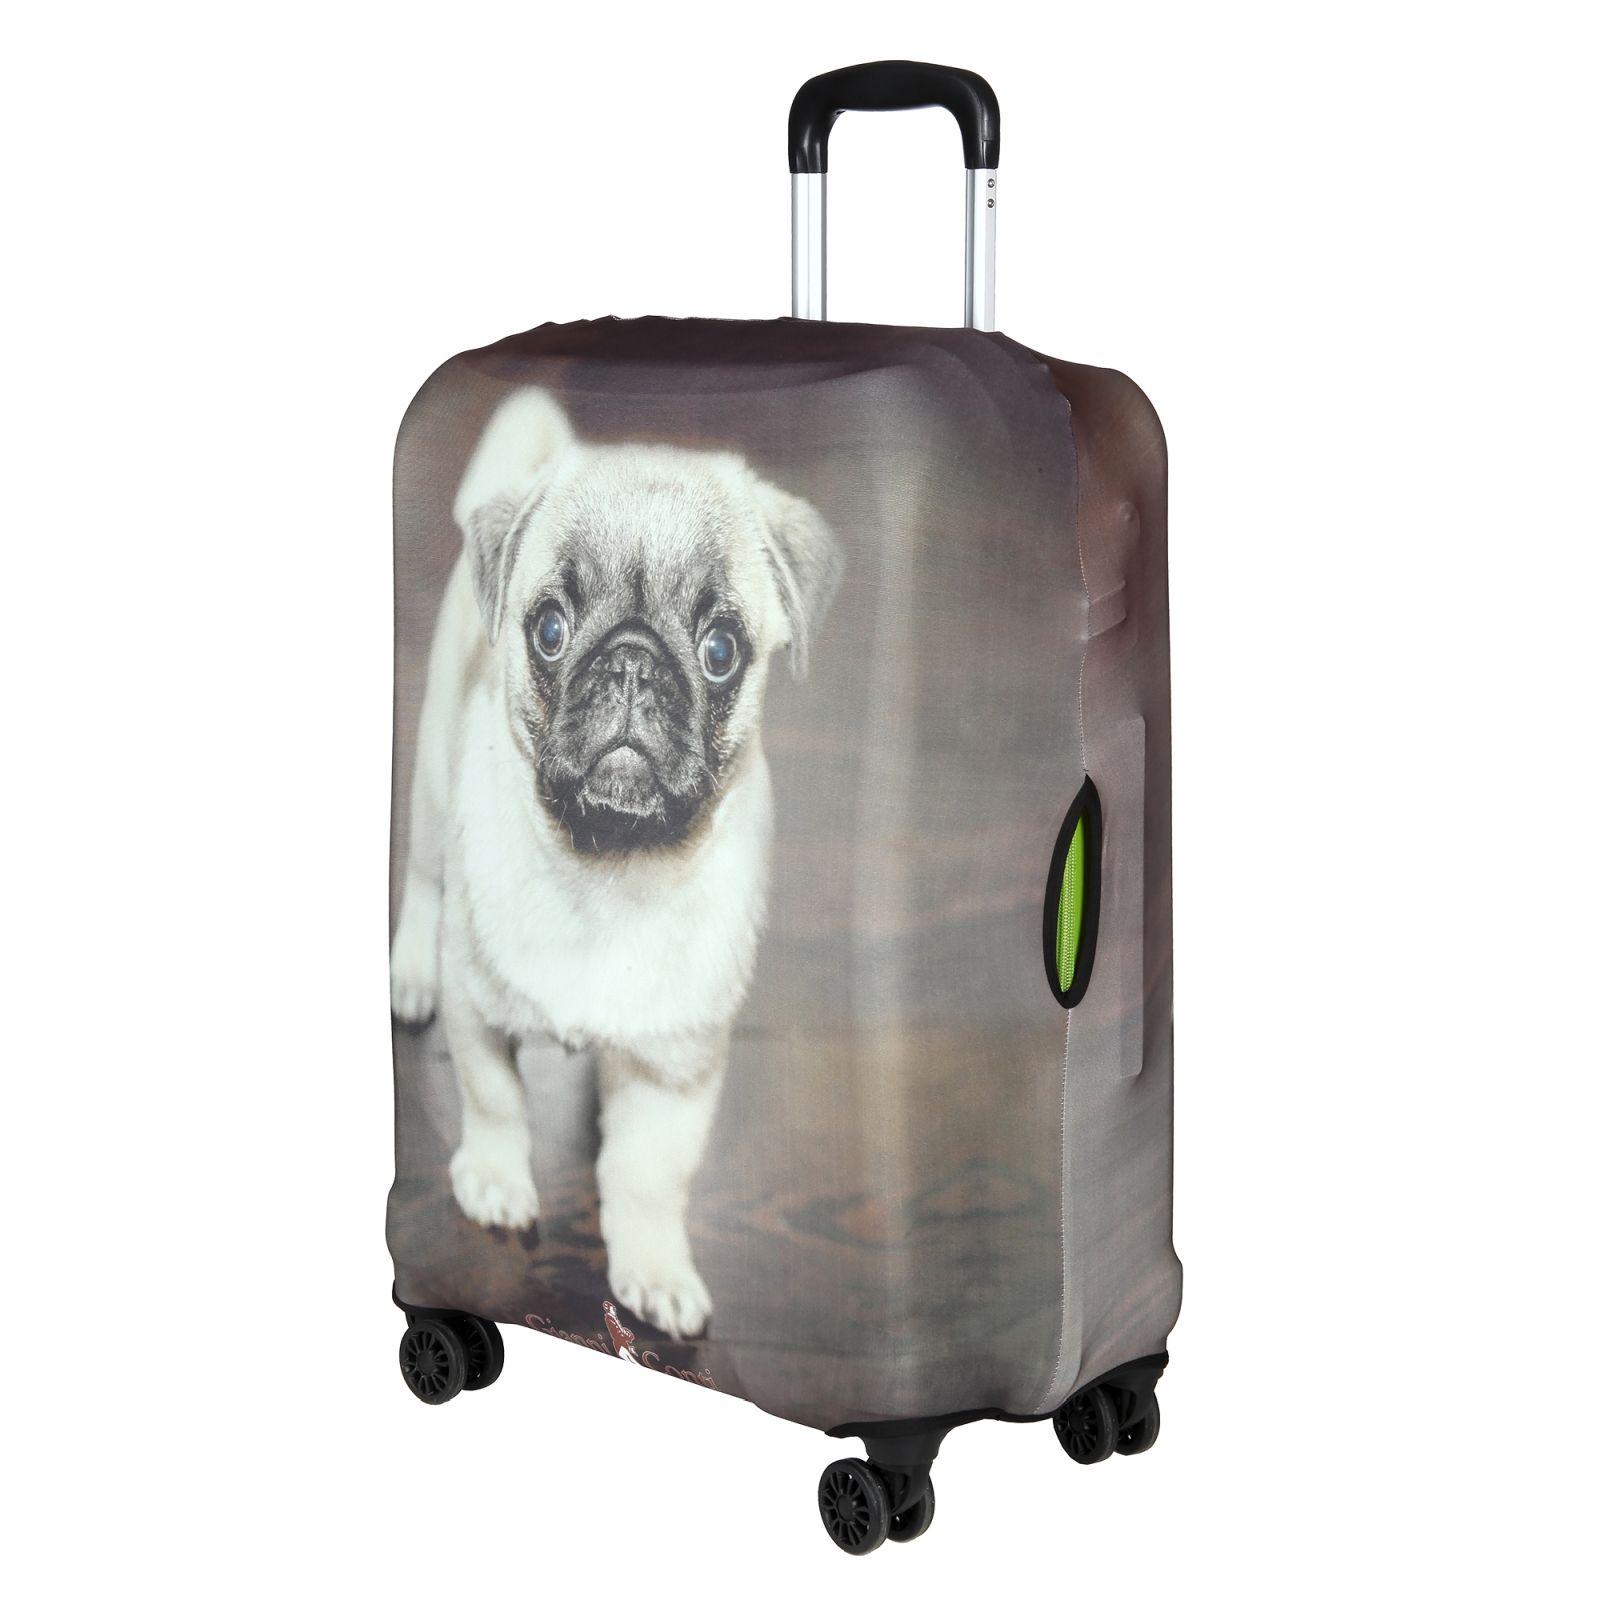 Защитное покрытие для чемодана Gianni Conti 9053 M.